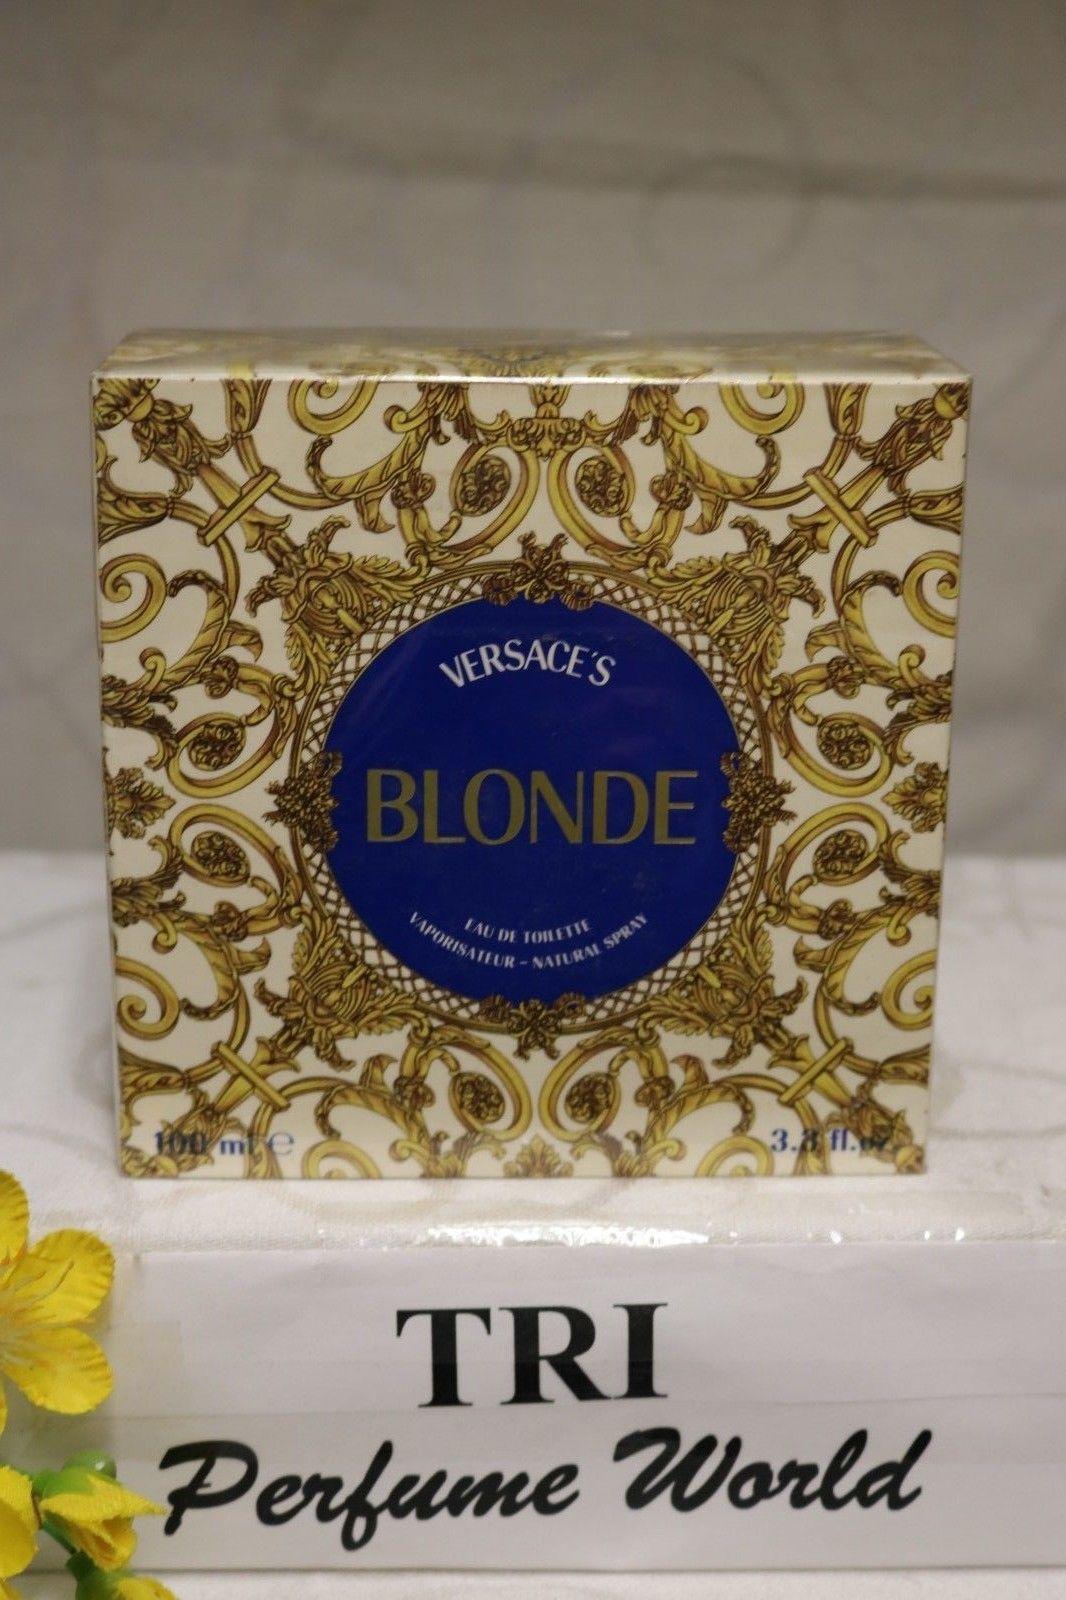 145 By Versace Eau De Toilette Spray 67Blonde FlOz Women 3 3 KcJF1l